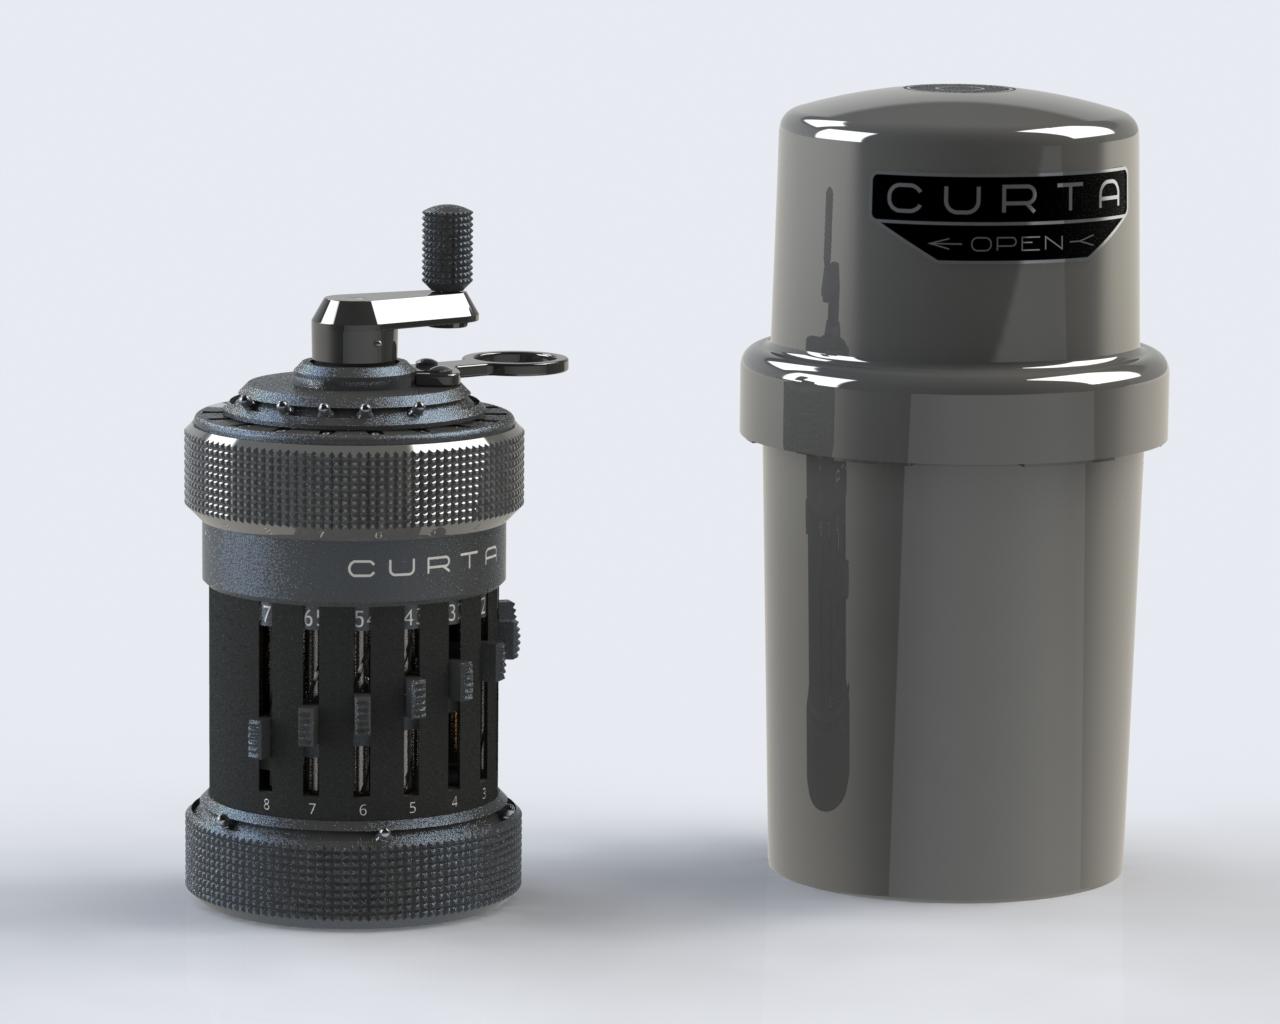 Curta手持机械式计算机器3D图纸(Type 1 ca 1930) Solidworks设计